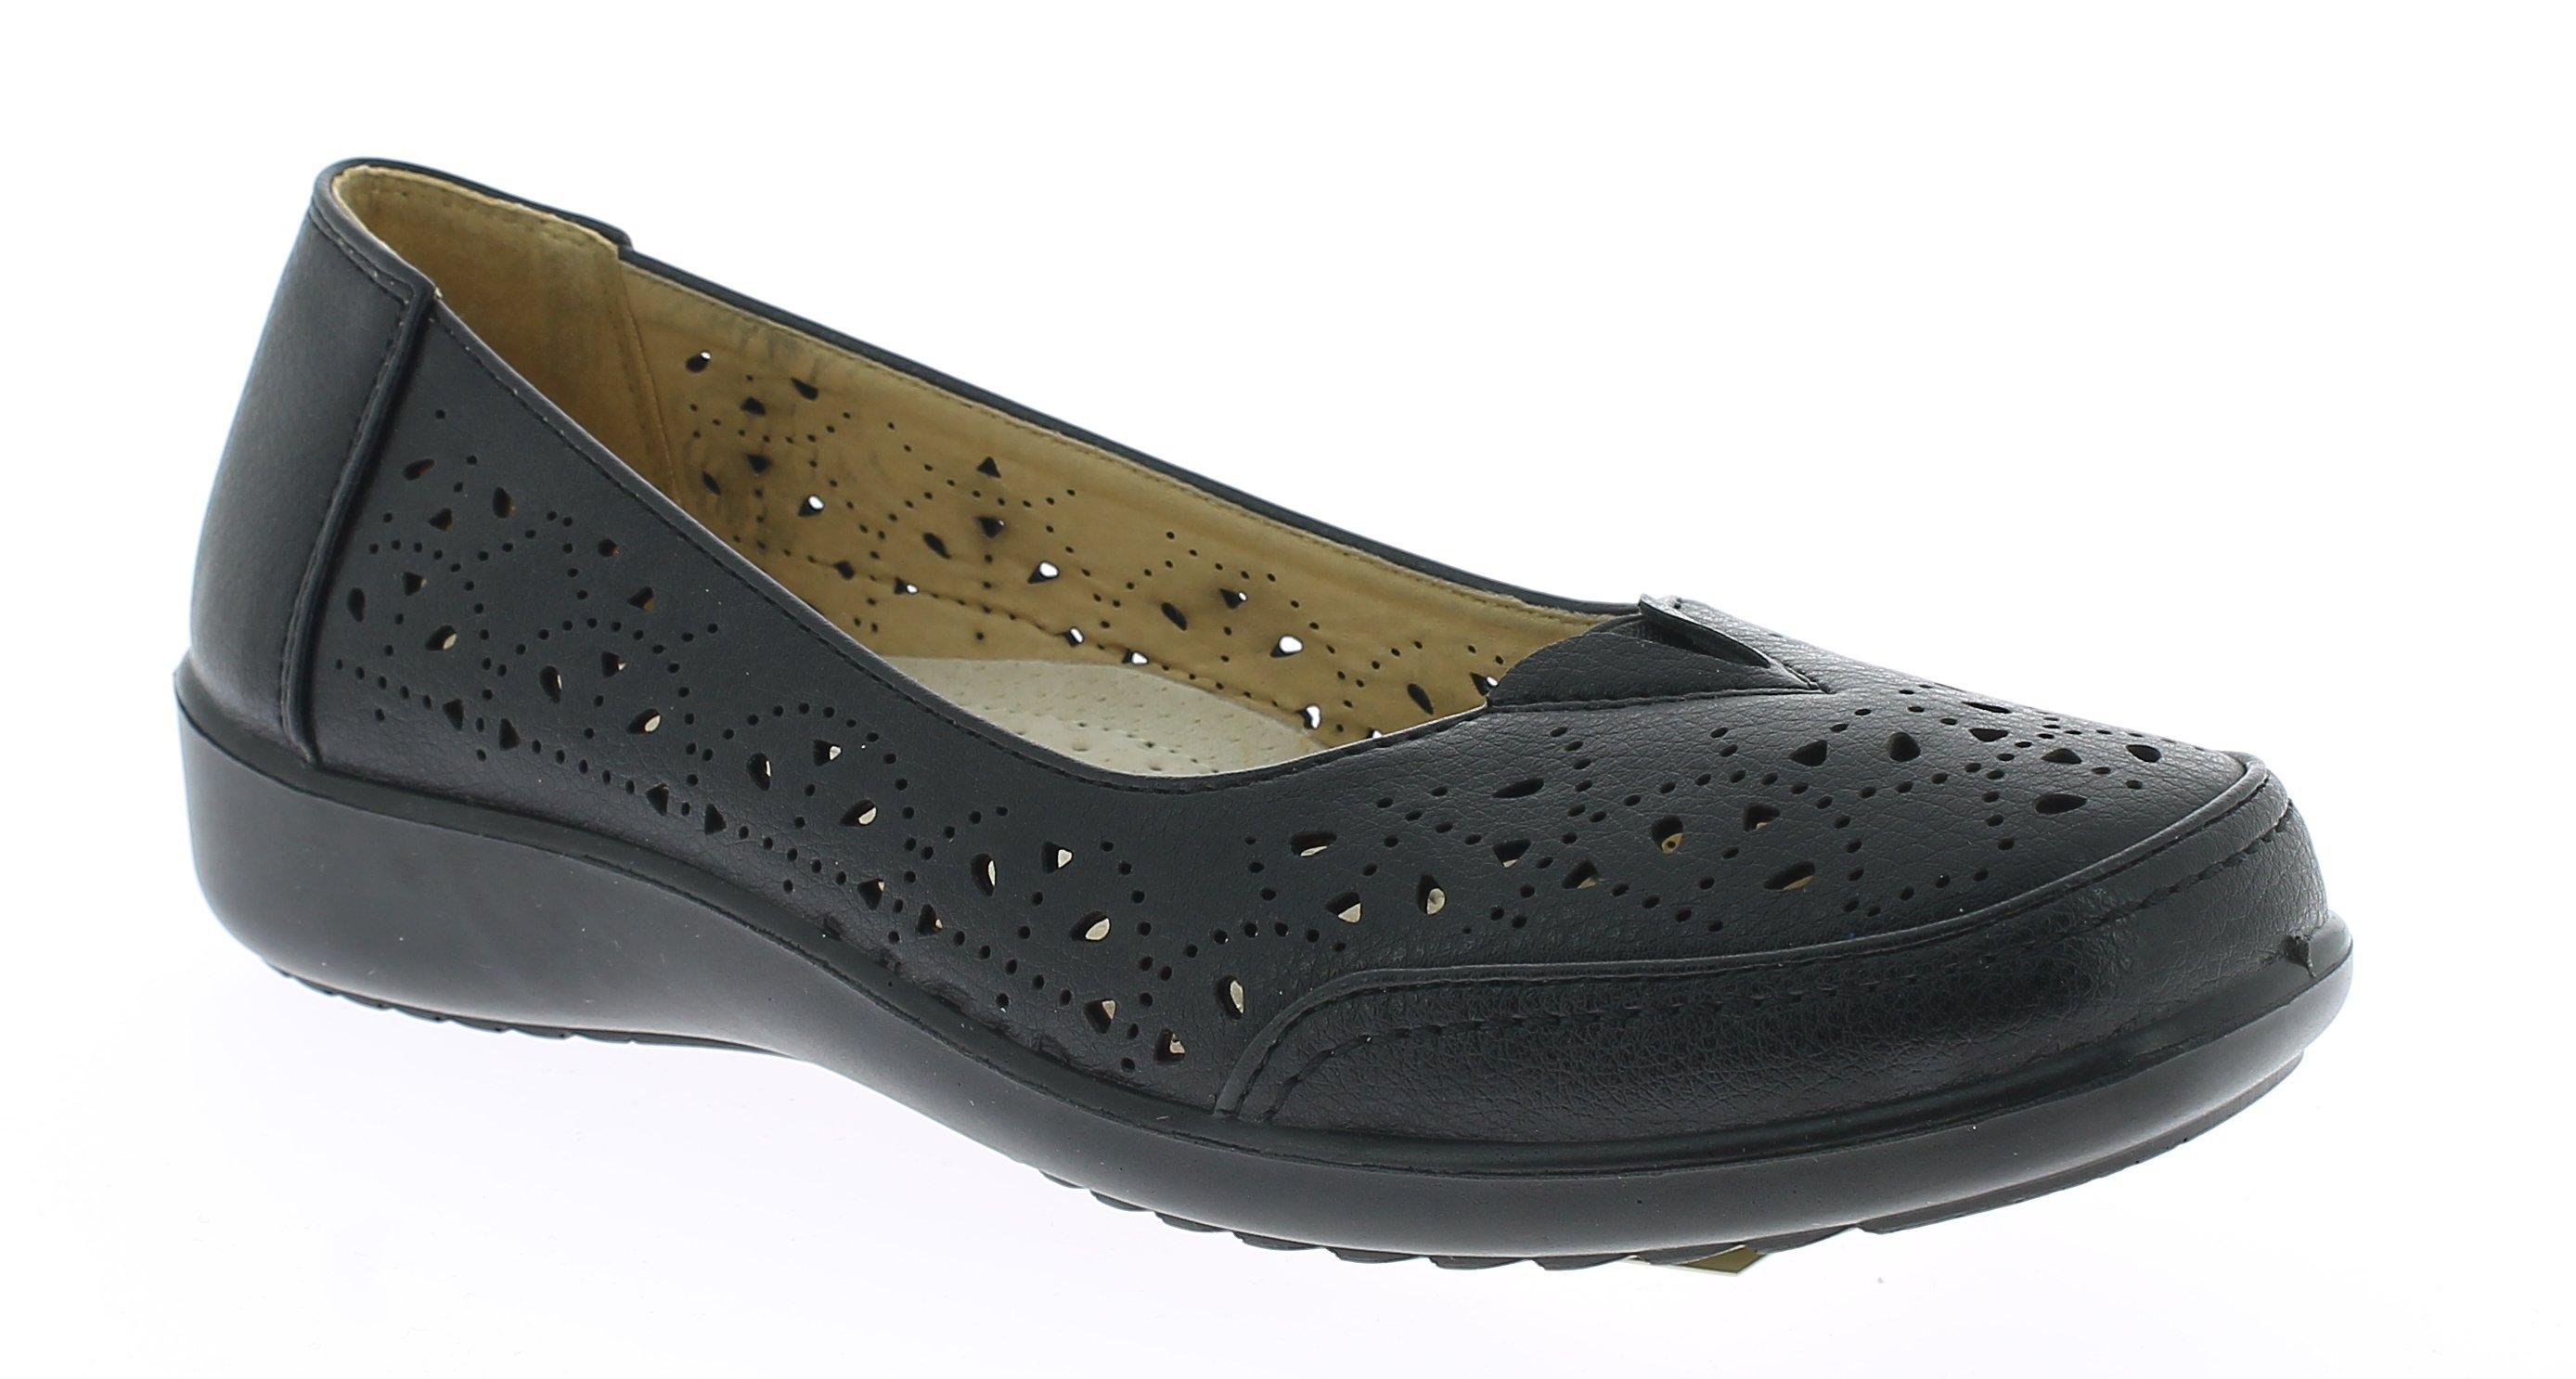 ANTRIN Γυναικείο Comfort NICOLE-105 Μαύρο - IqShoes - NICOLE-105 BLACK -black-39 προϊόντα παπούτσια